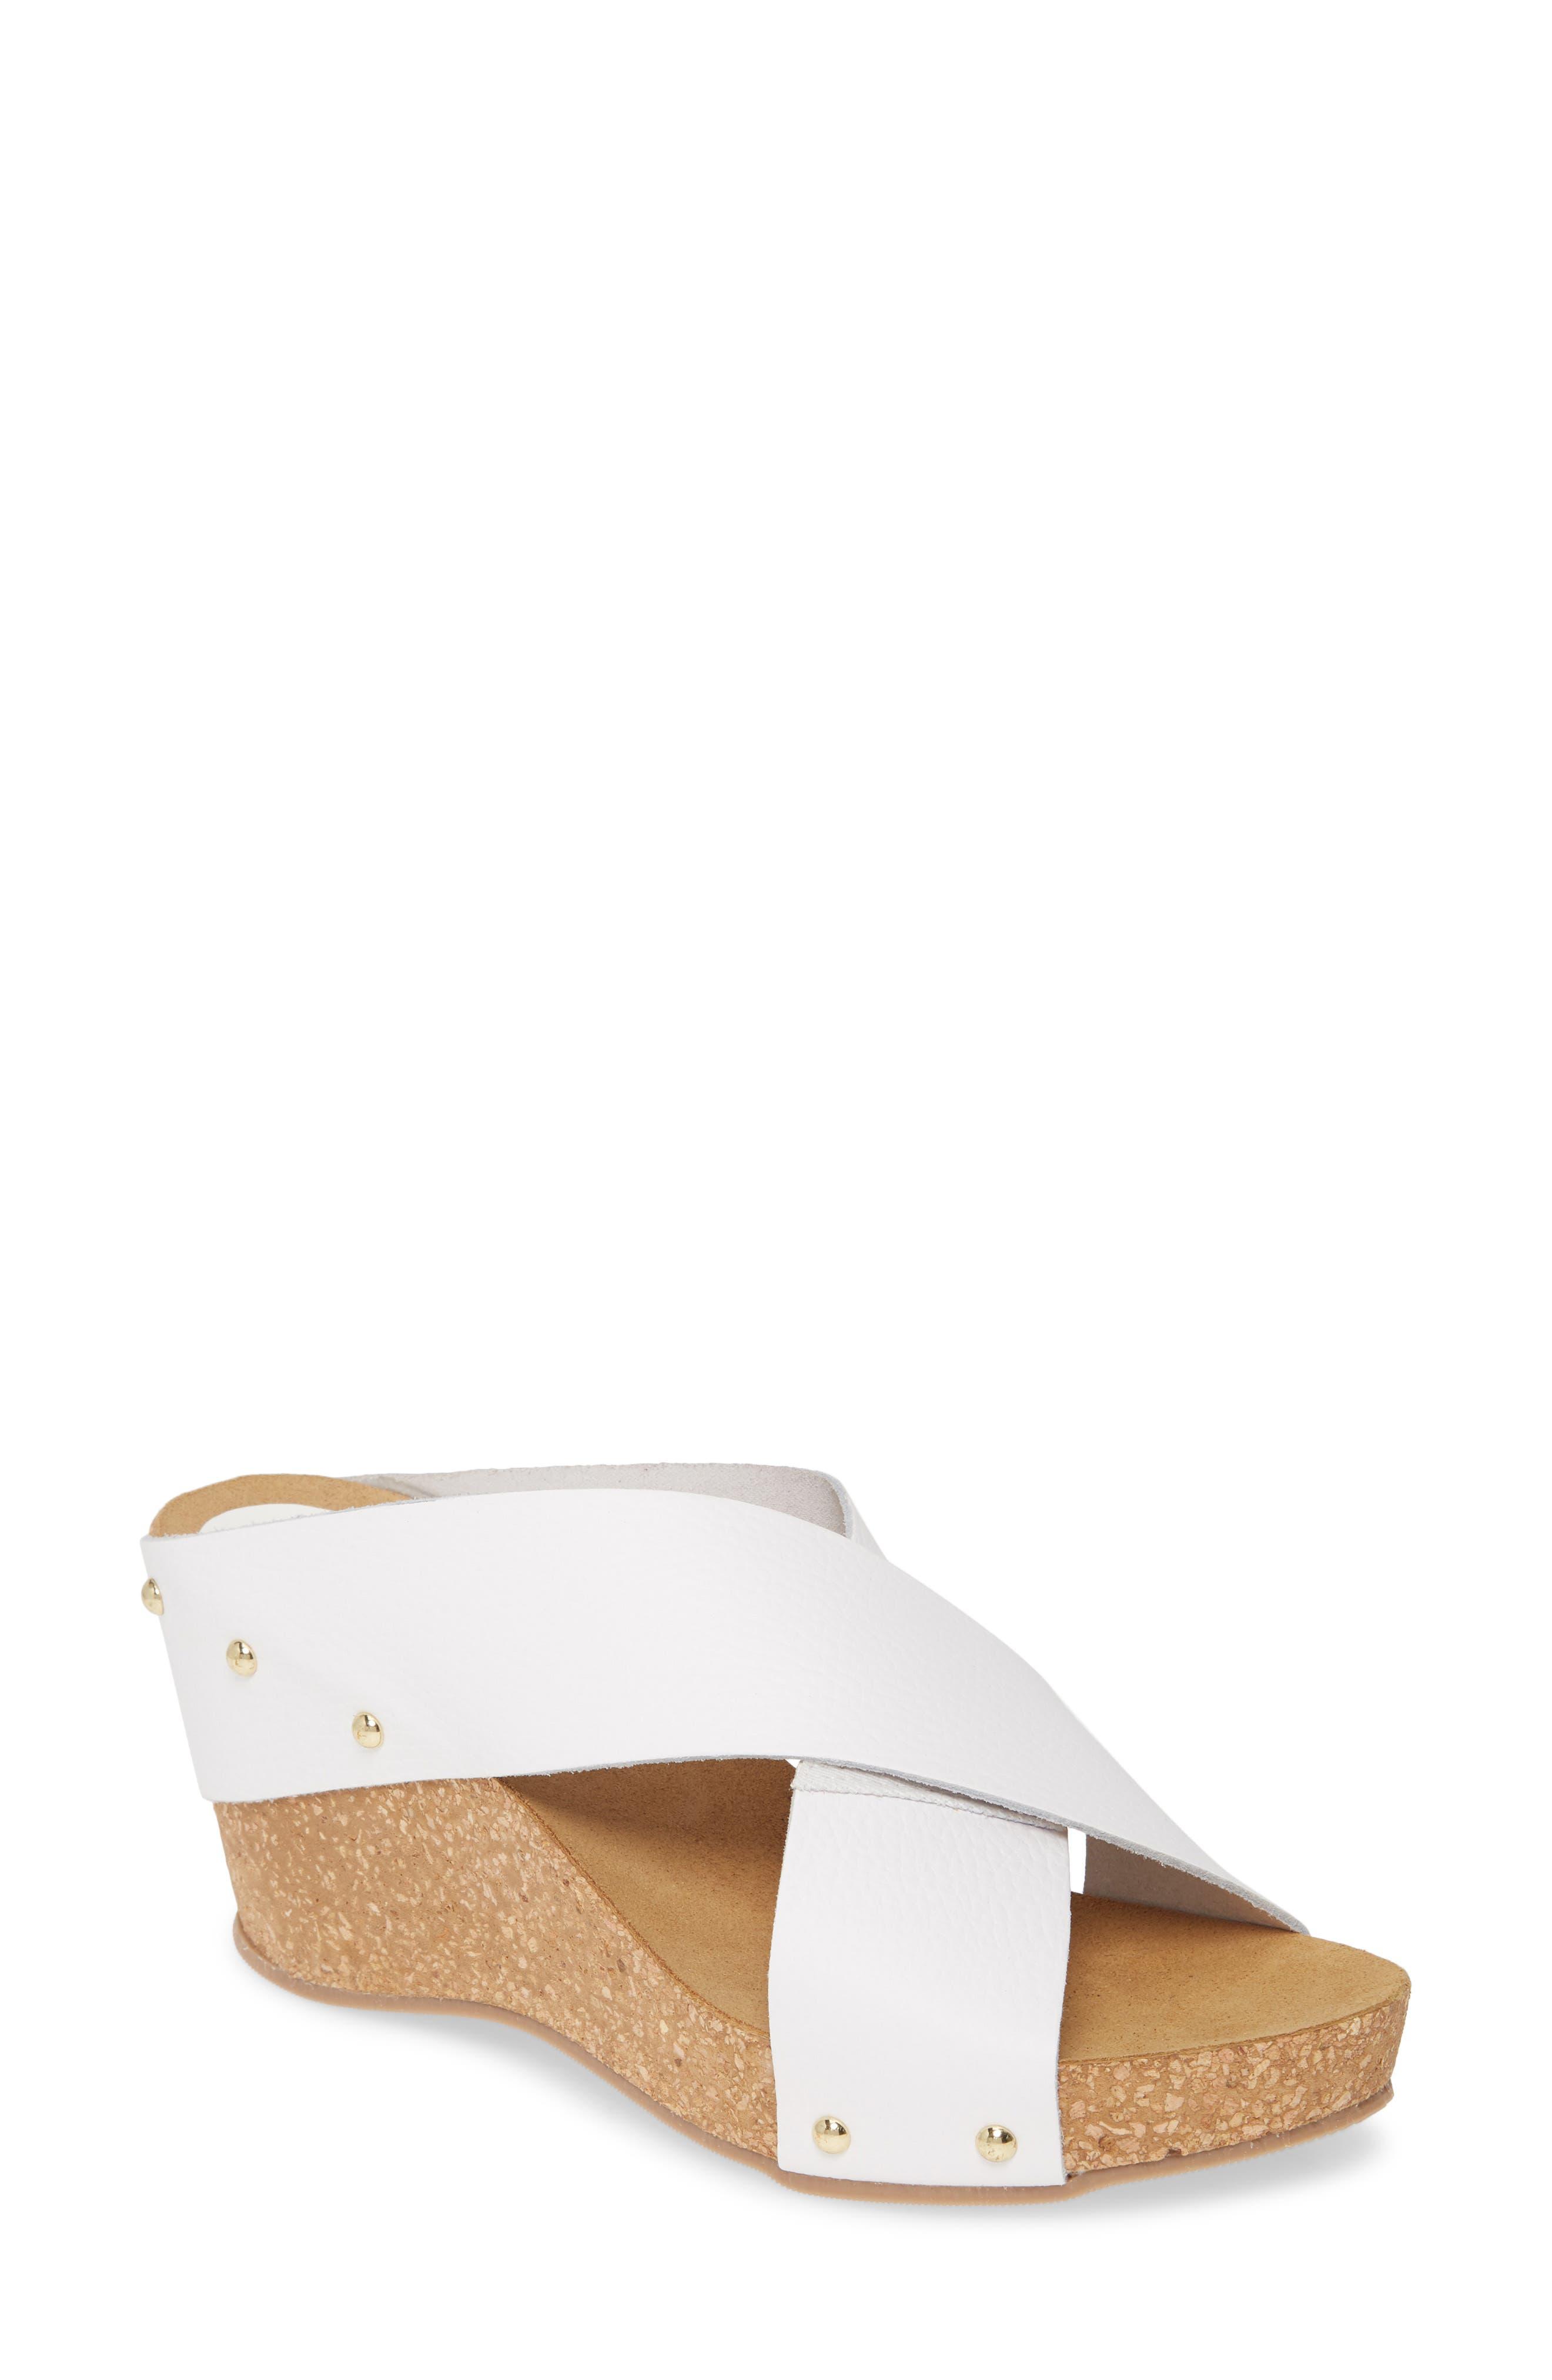 297f4f6349e Buy carvela kurt geiger shoes for women - Best women's carvela kurt ...